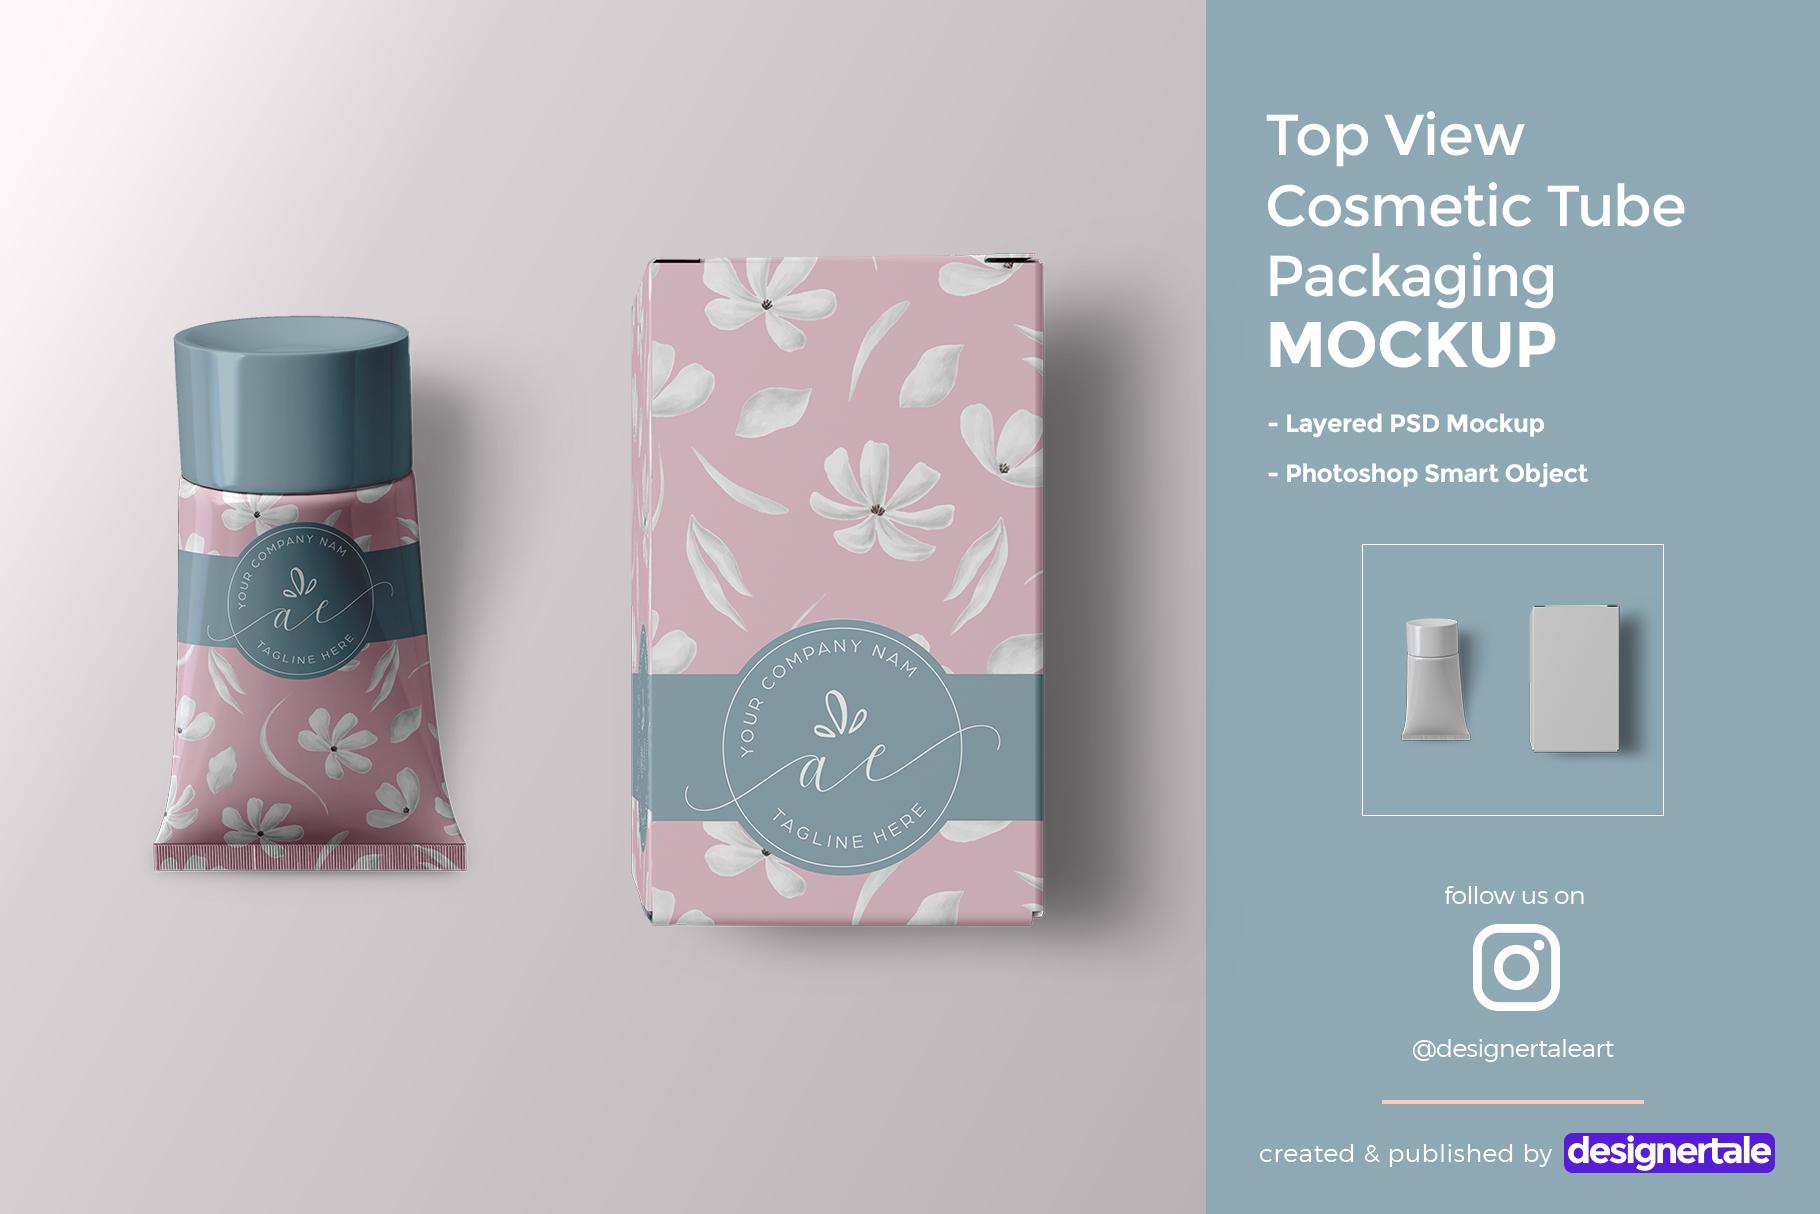 top view cosmetic tube packaging mockup